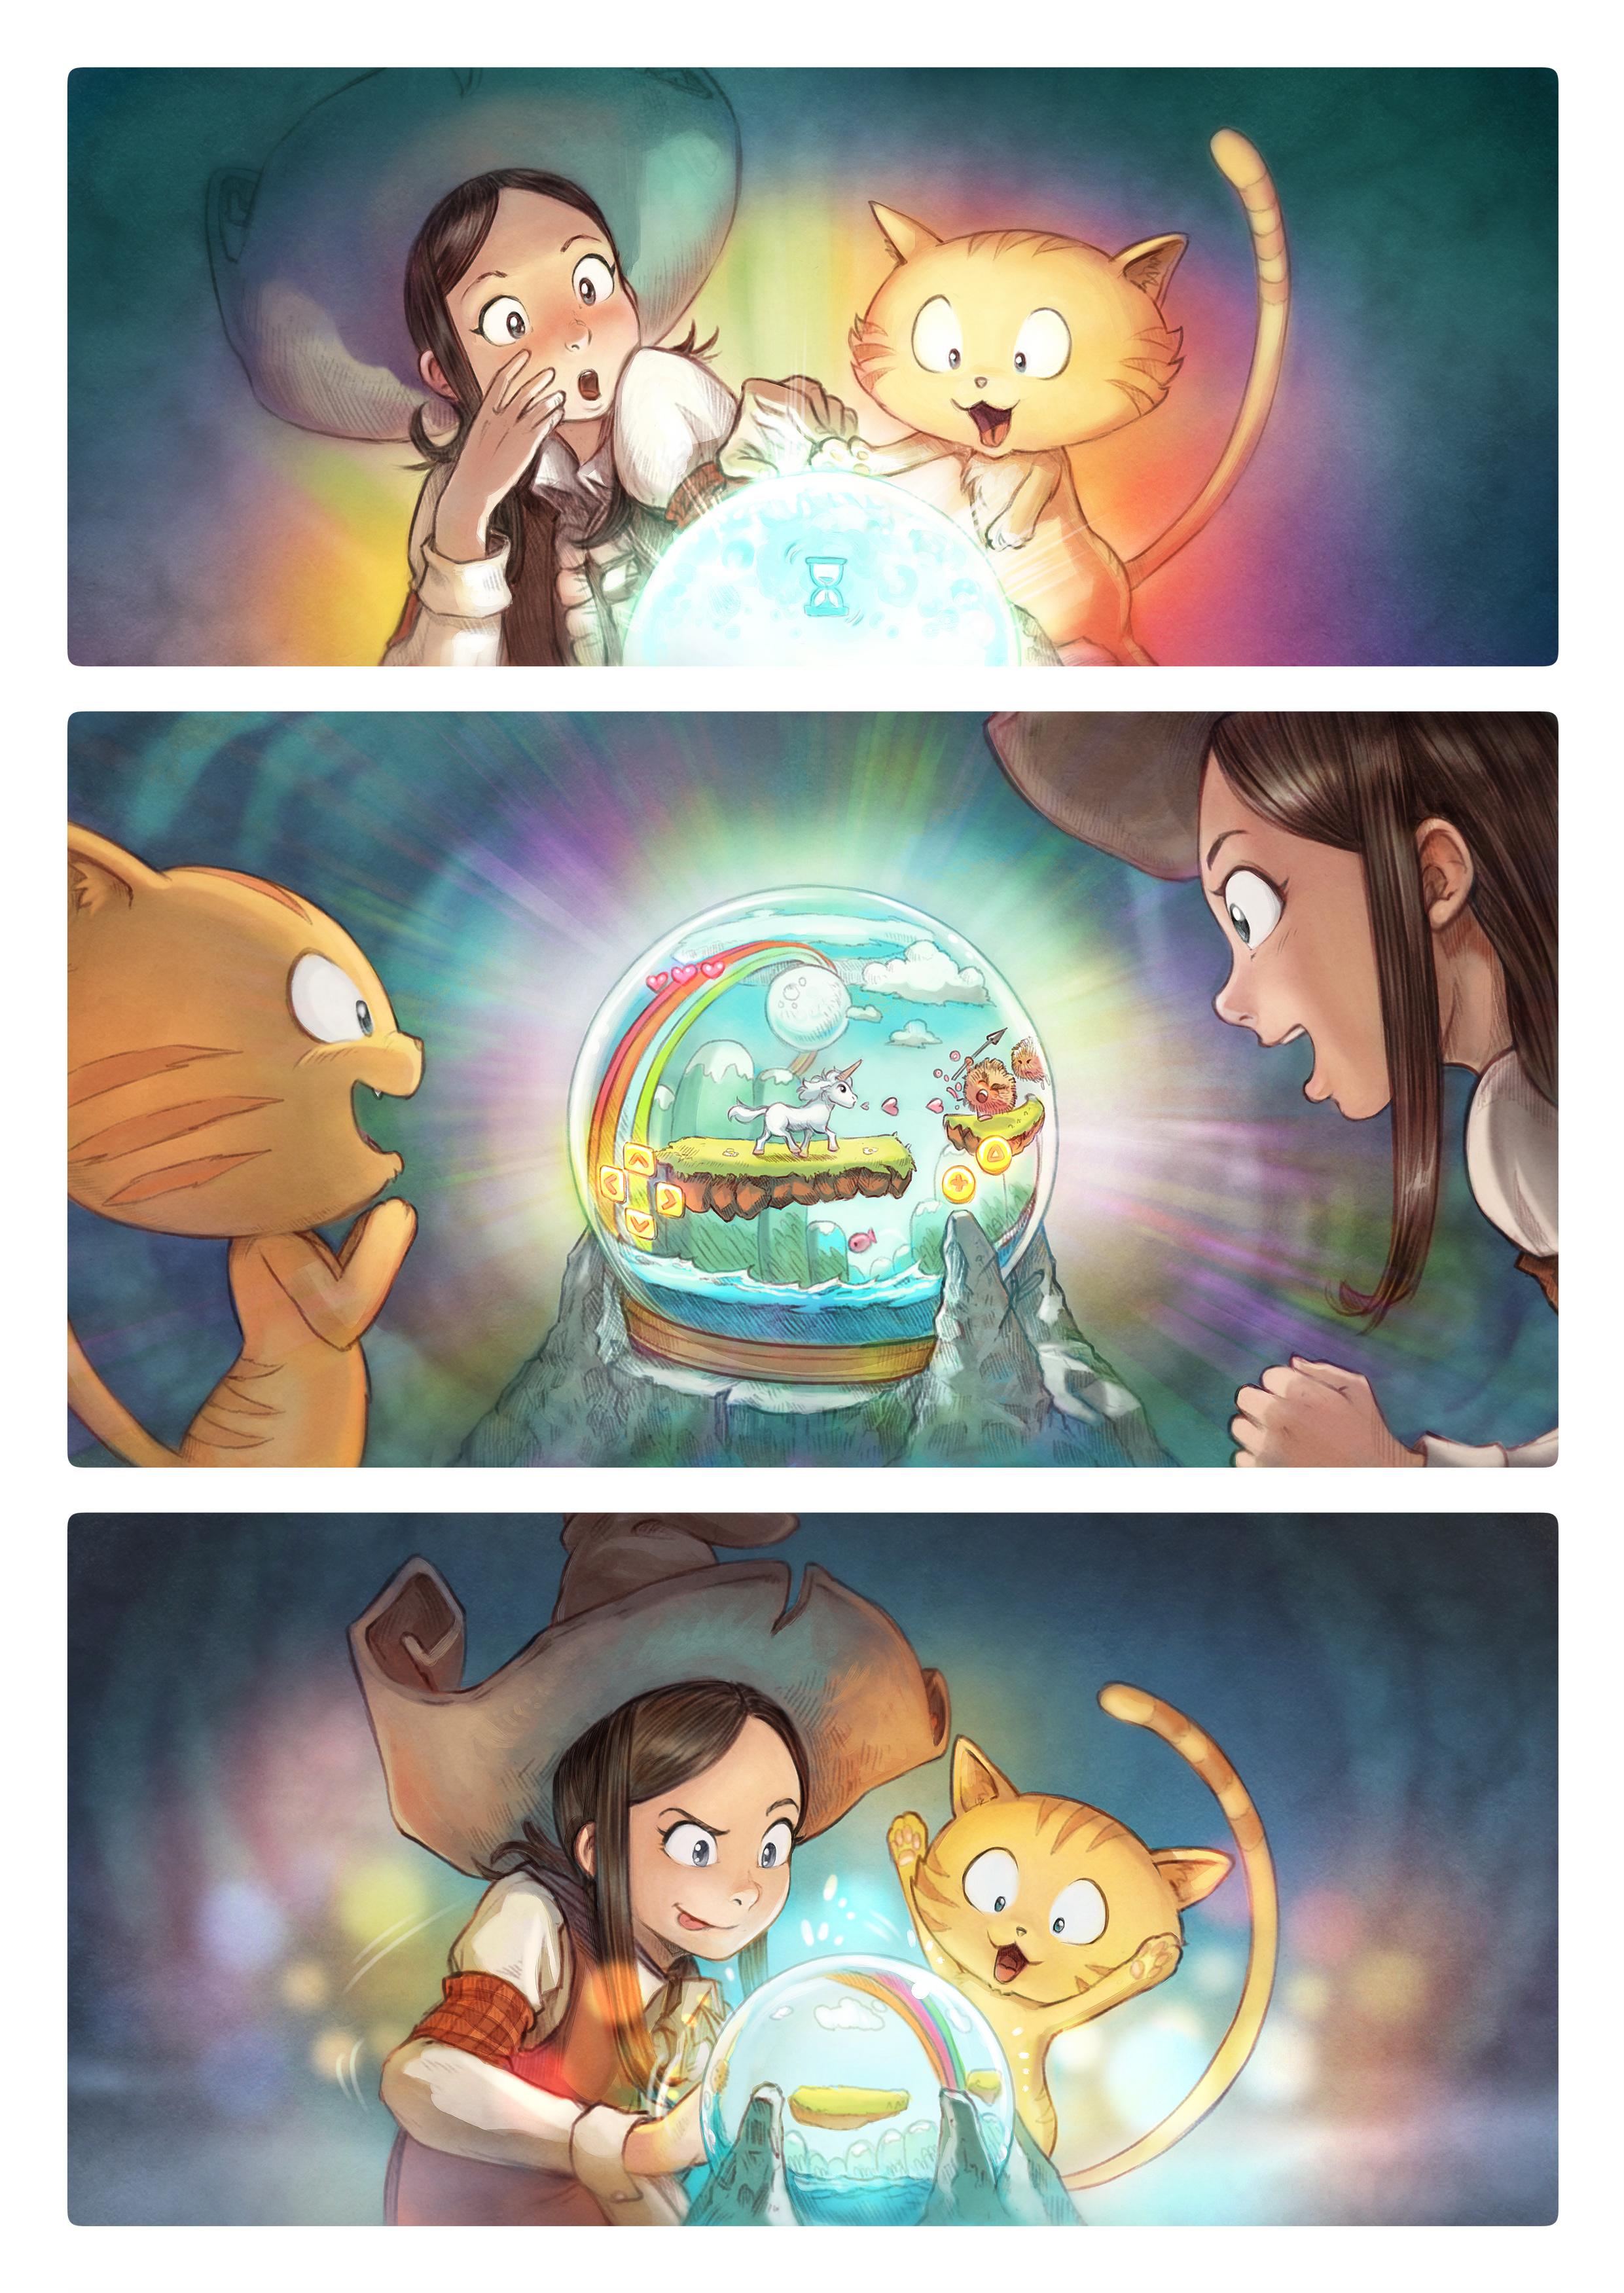 A webcomic page of Pepper&Carrot, Tập 15 [vi], trang 4